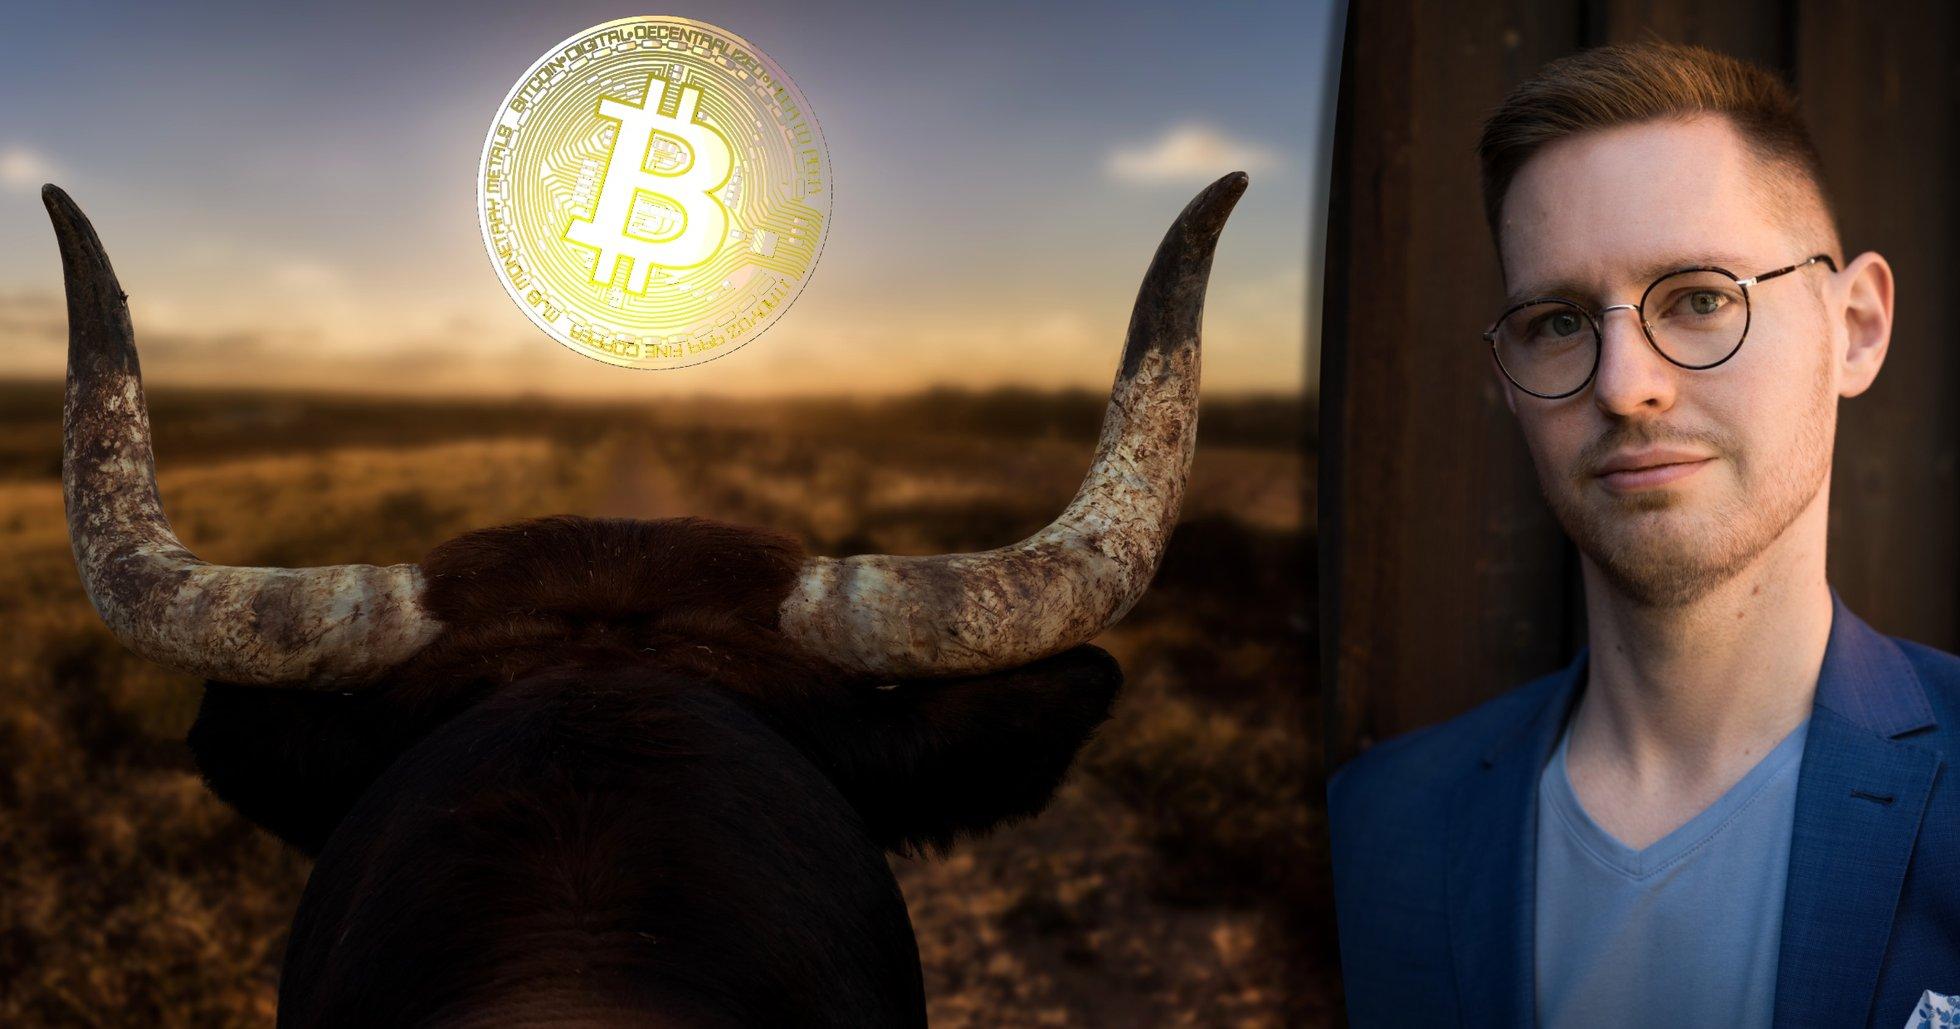 Bitcoinpriset visar styrka: